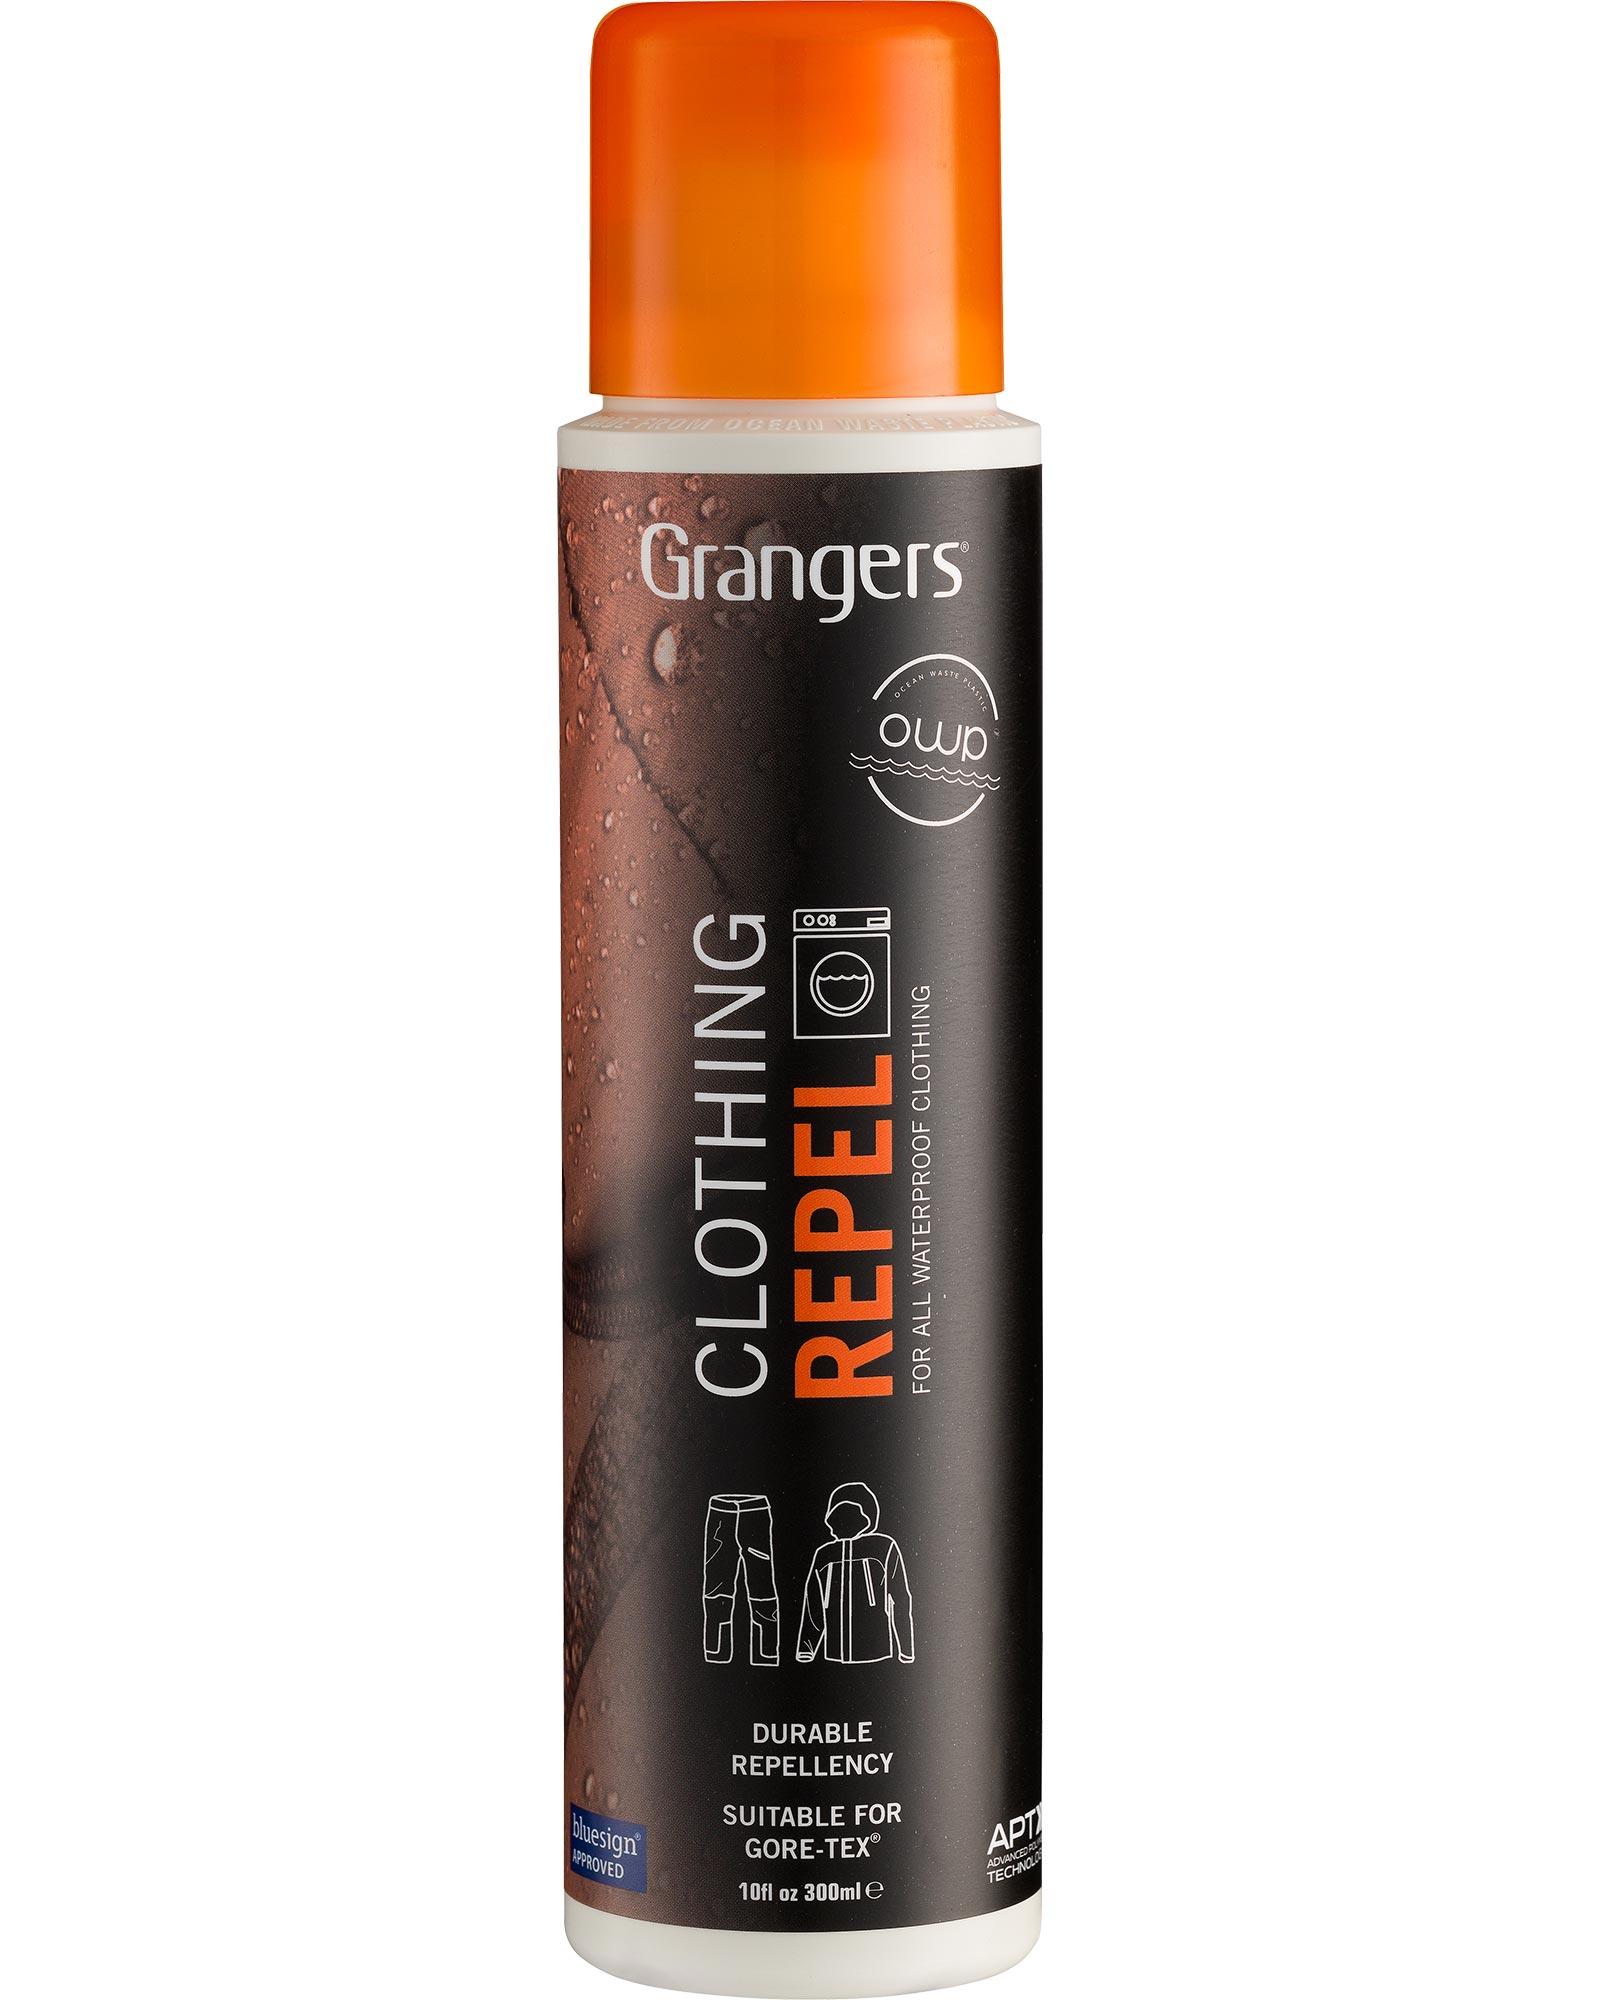 Grangers Clothing Repel 300ml 0